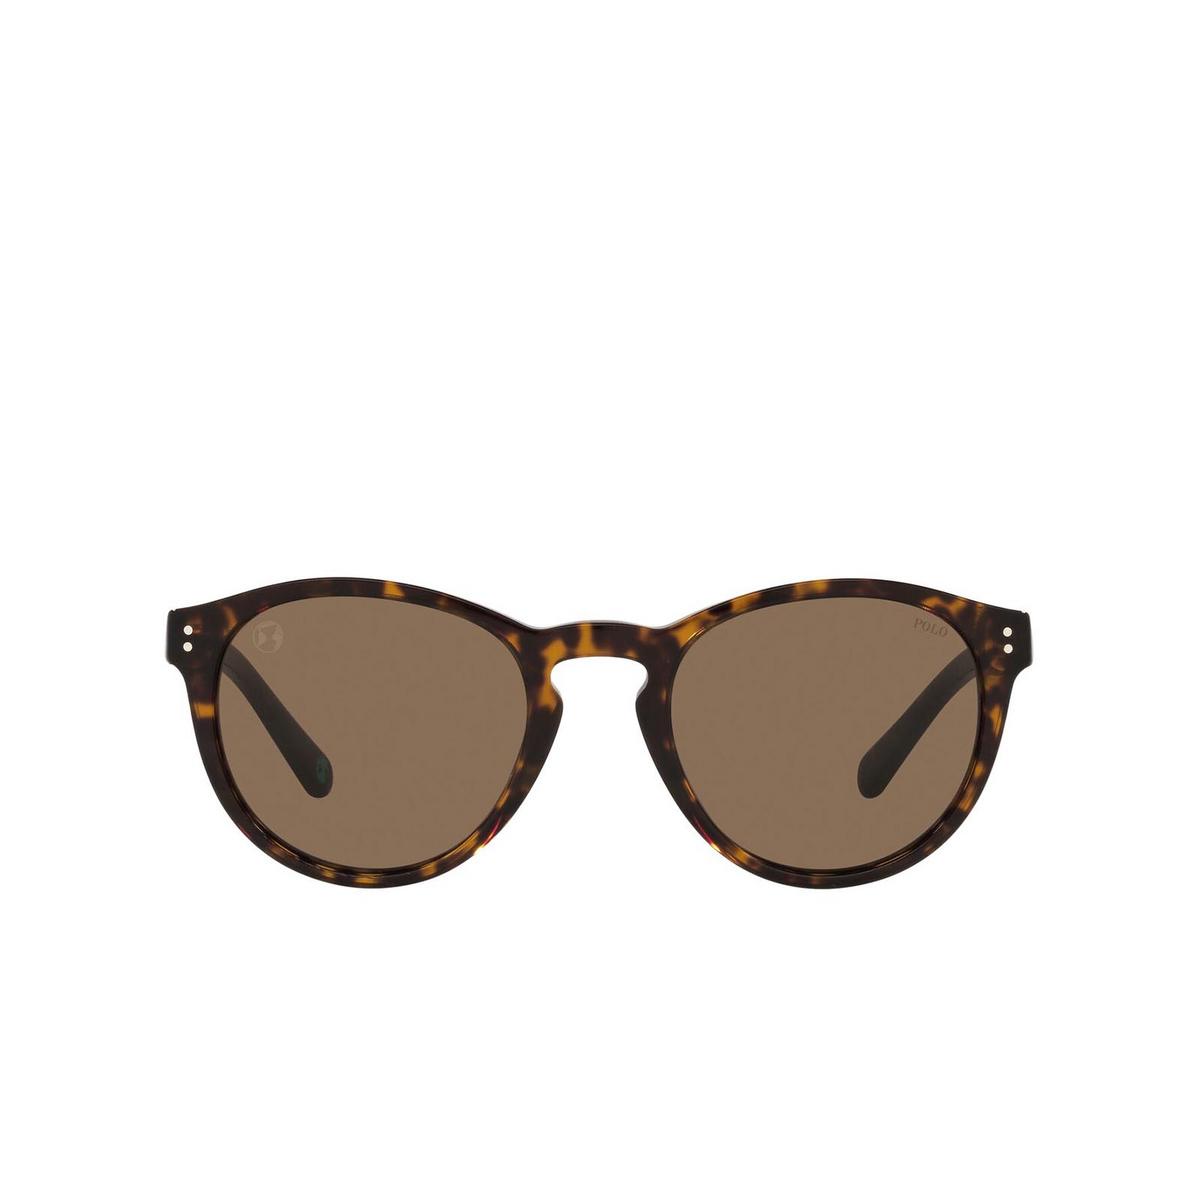 Polo Ralph Lauren® Round Sunglasses: PH4172 color Shiny Dark Havana 595473.